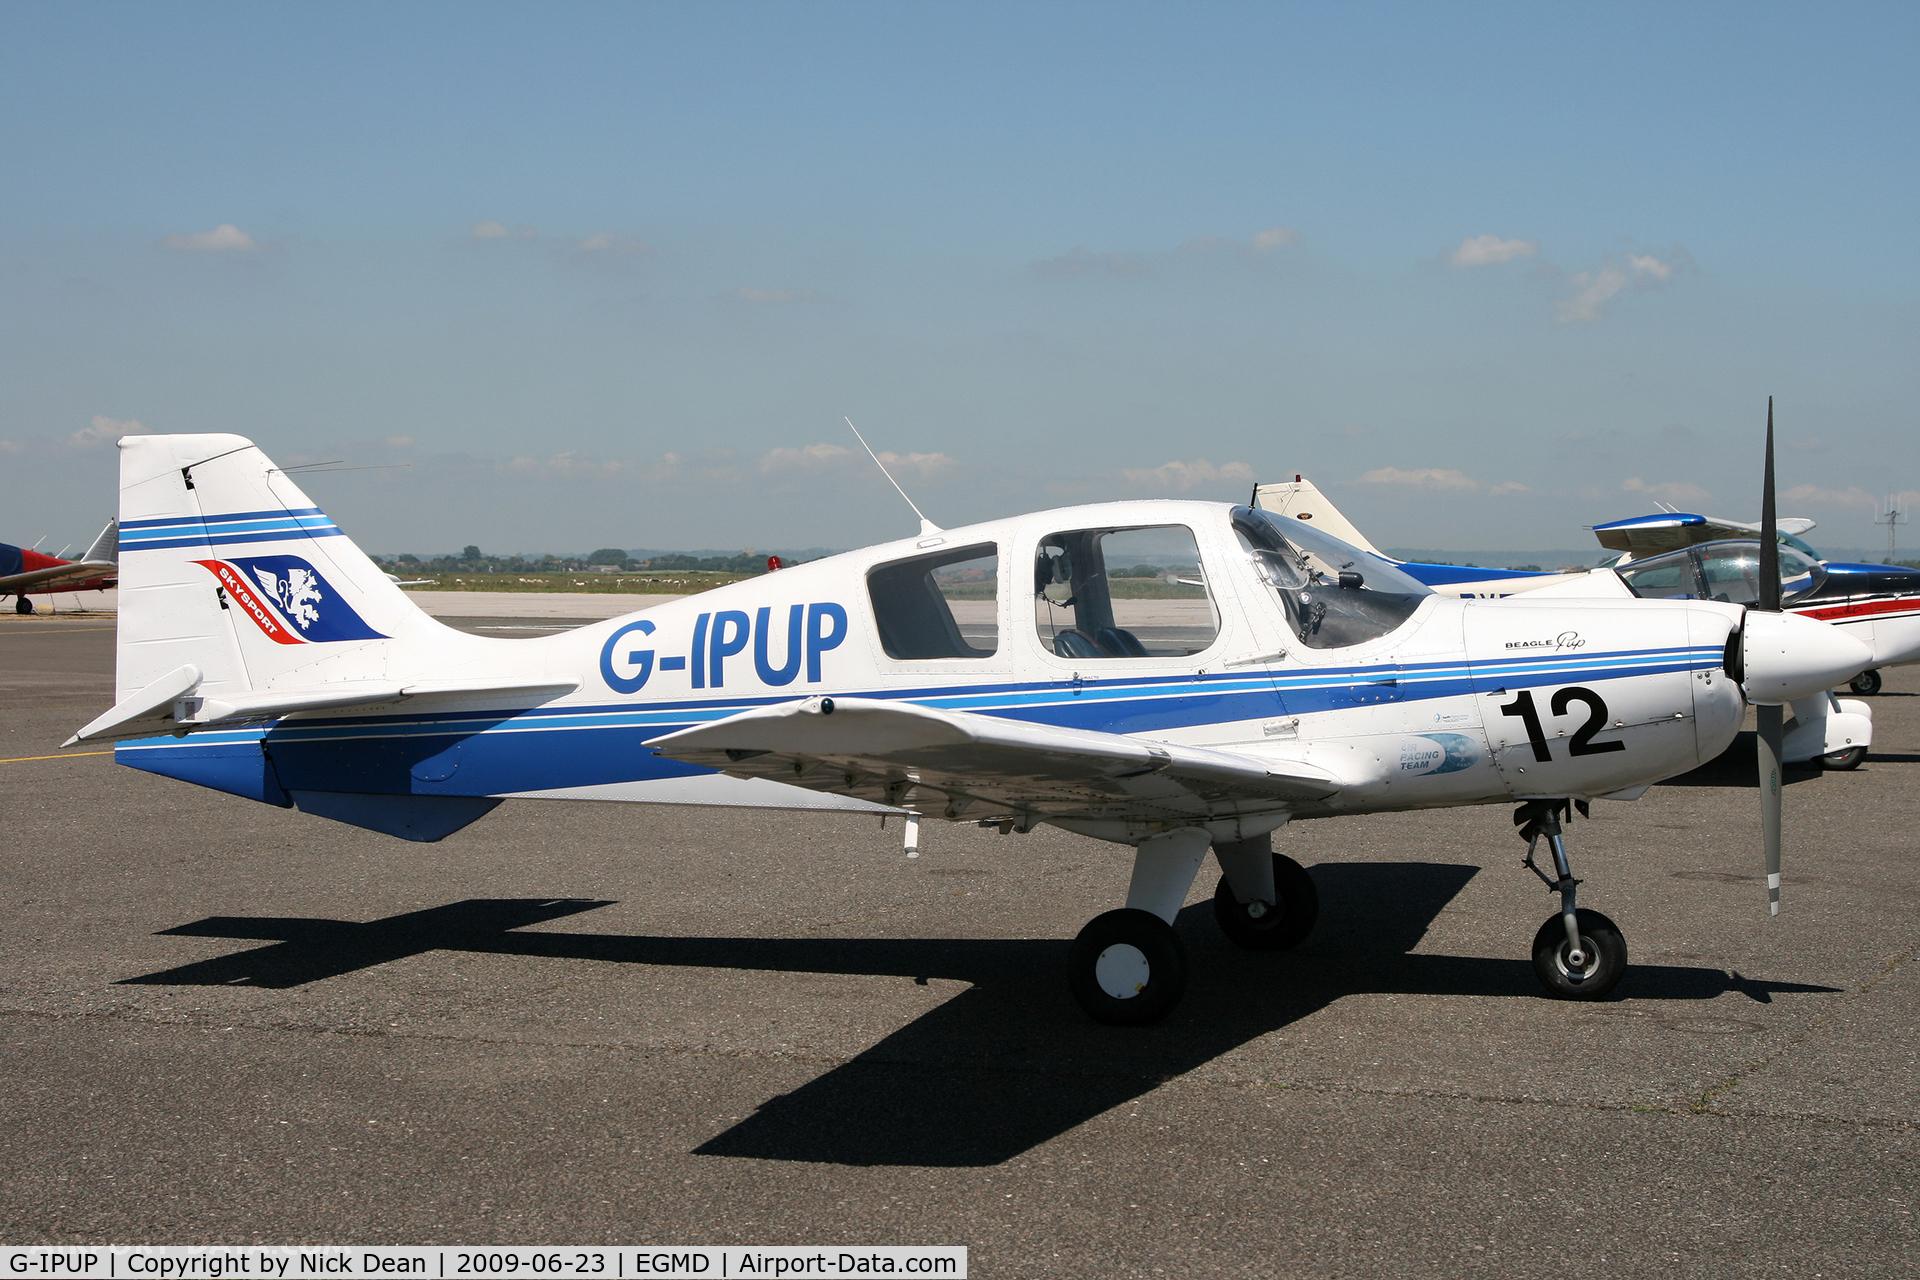 G-IPUP, 1969 Beagle B-121 Pup Series 2 (Pup 150) C/N B121-036, EGMD